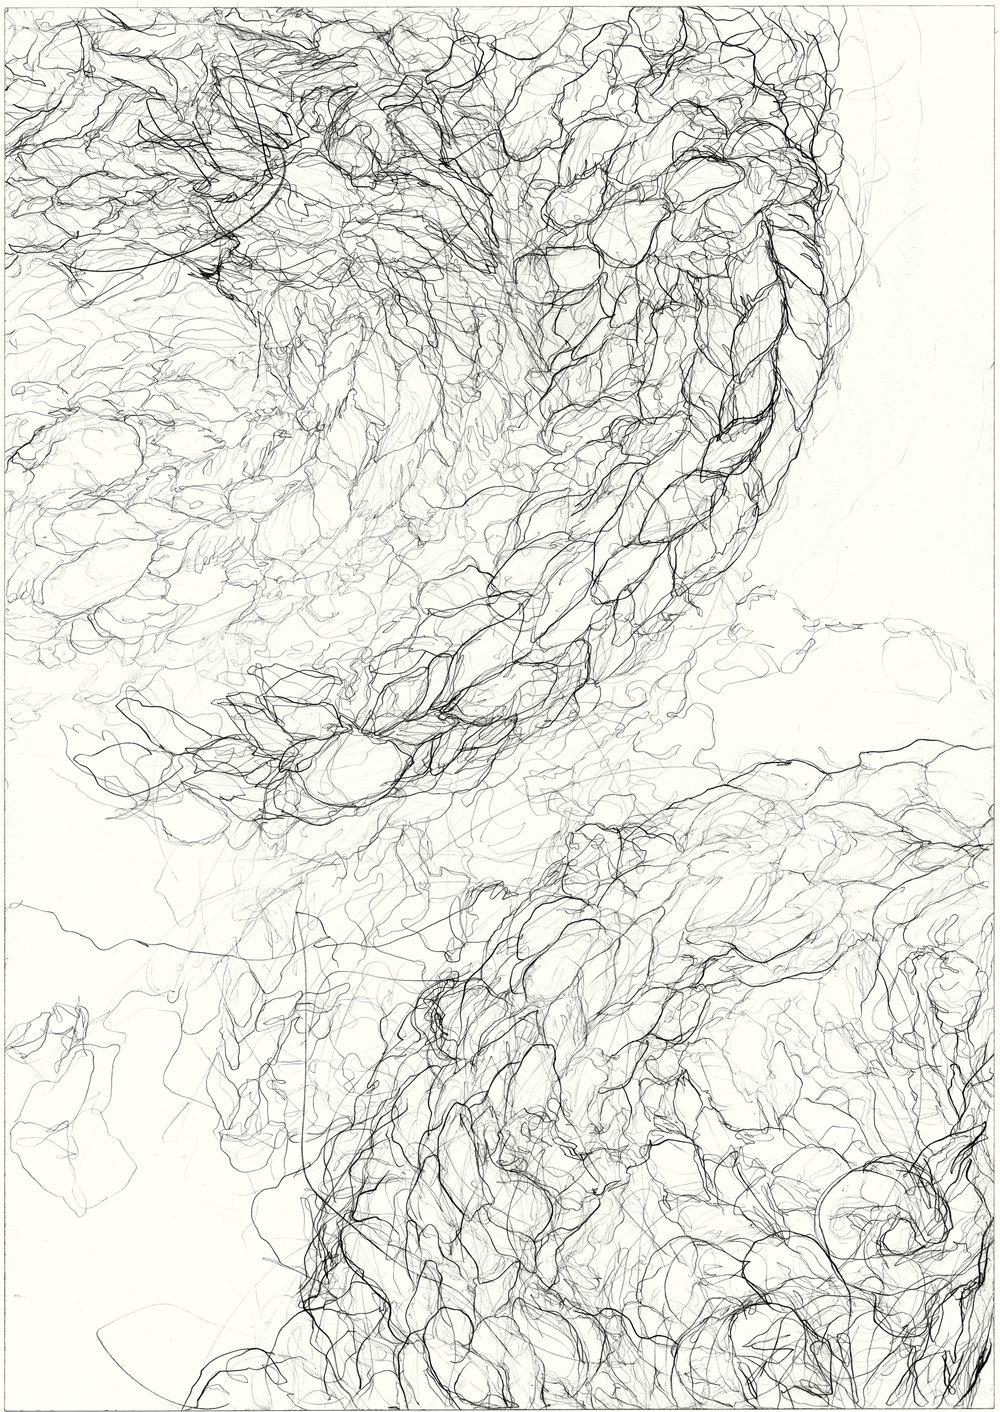 Dyskinesia  2011, pencil on paper, 84.1 cm x 59.5 cm.